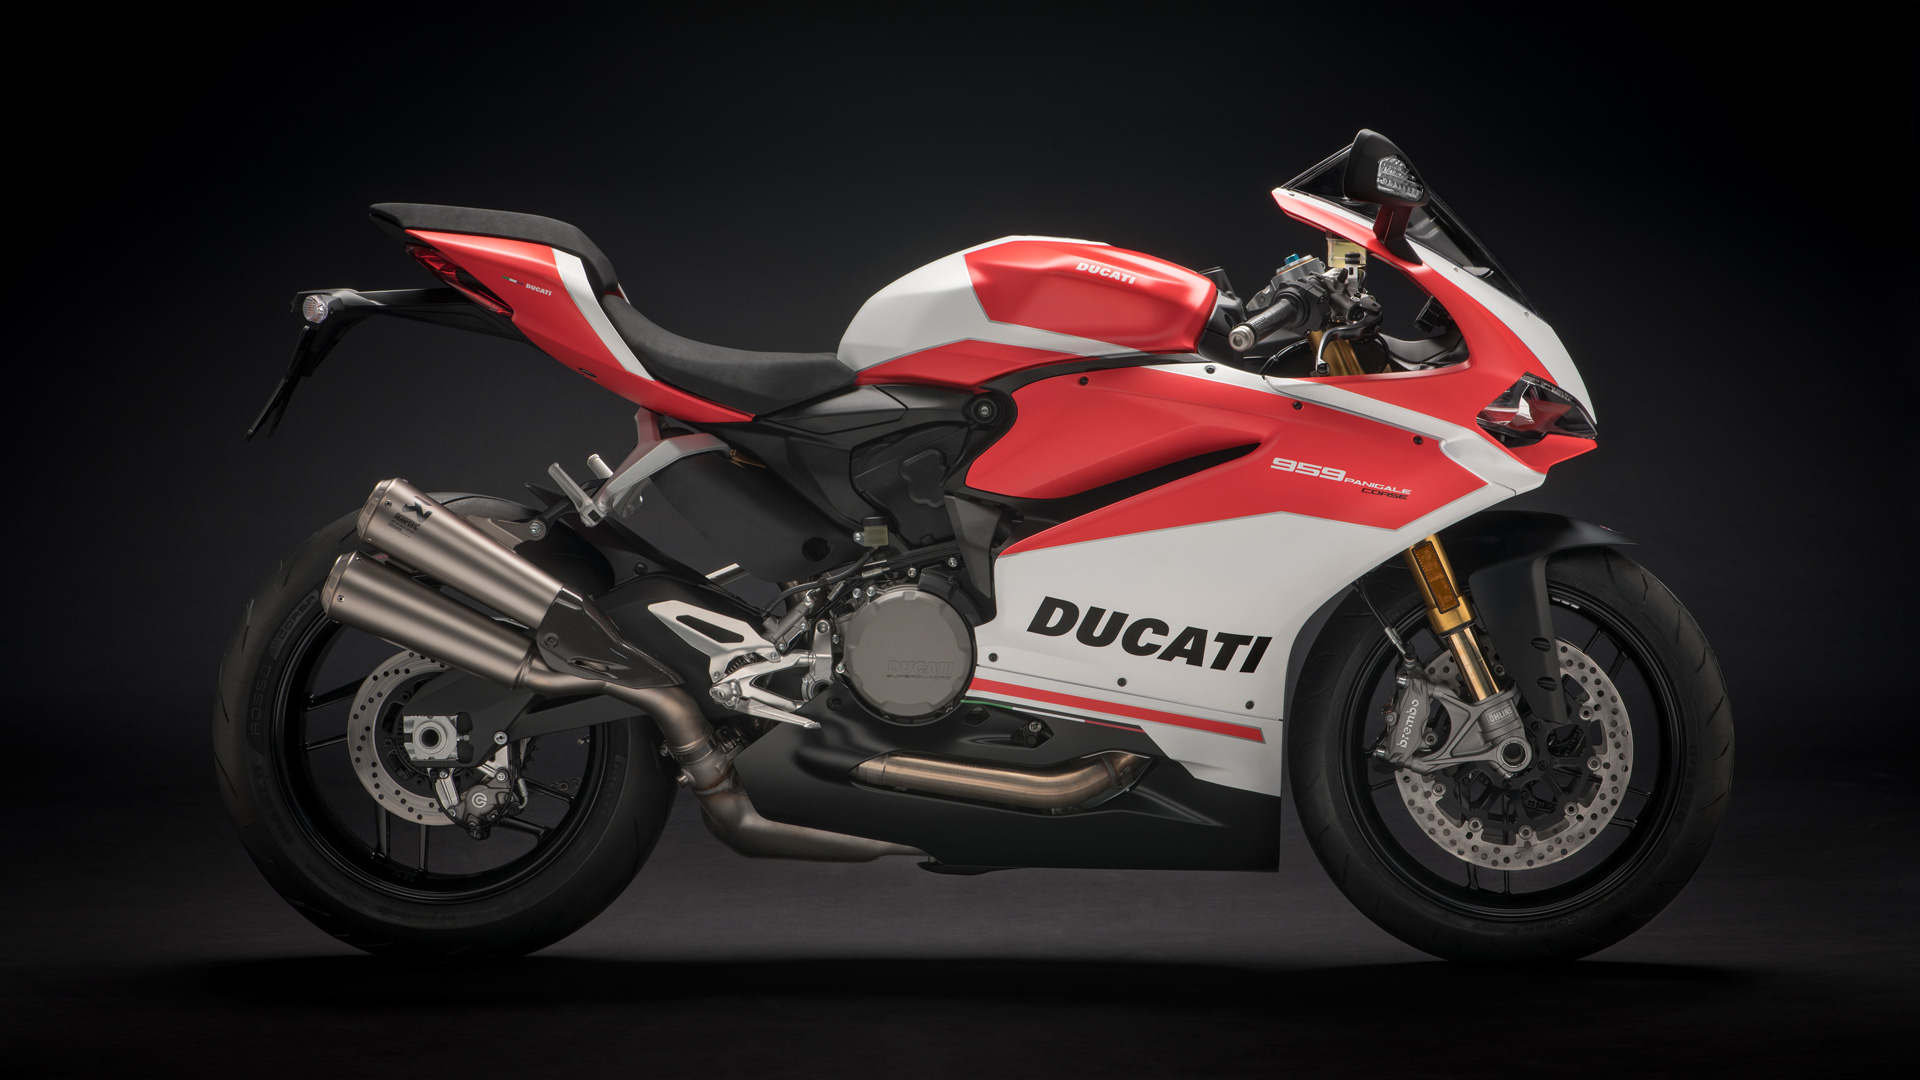 ducati superbike 959 panigale: racing attitude